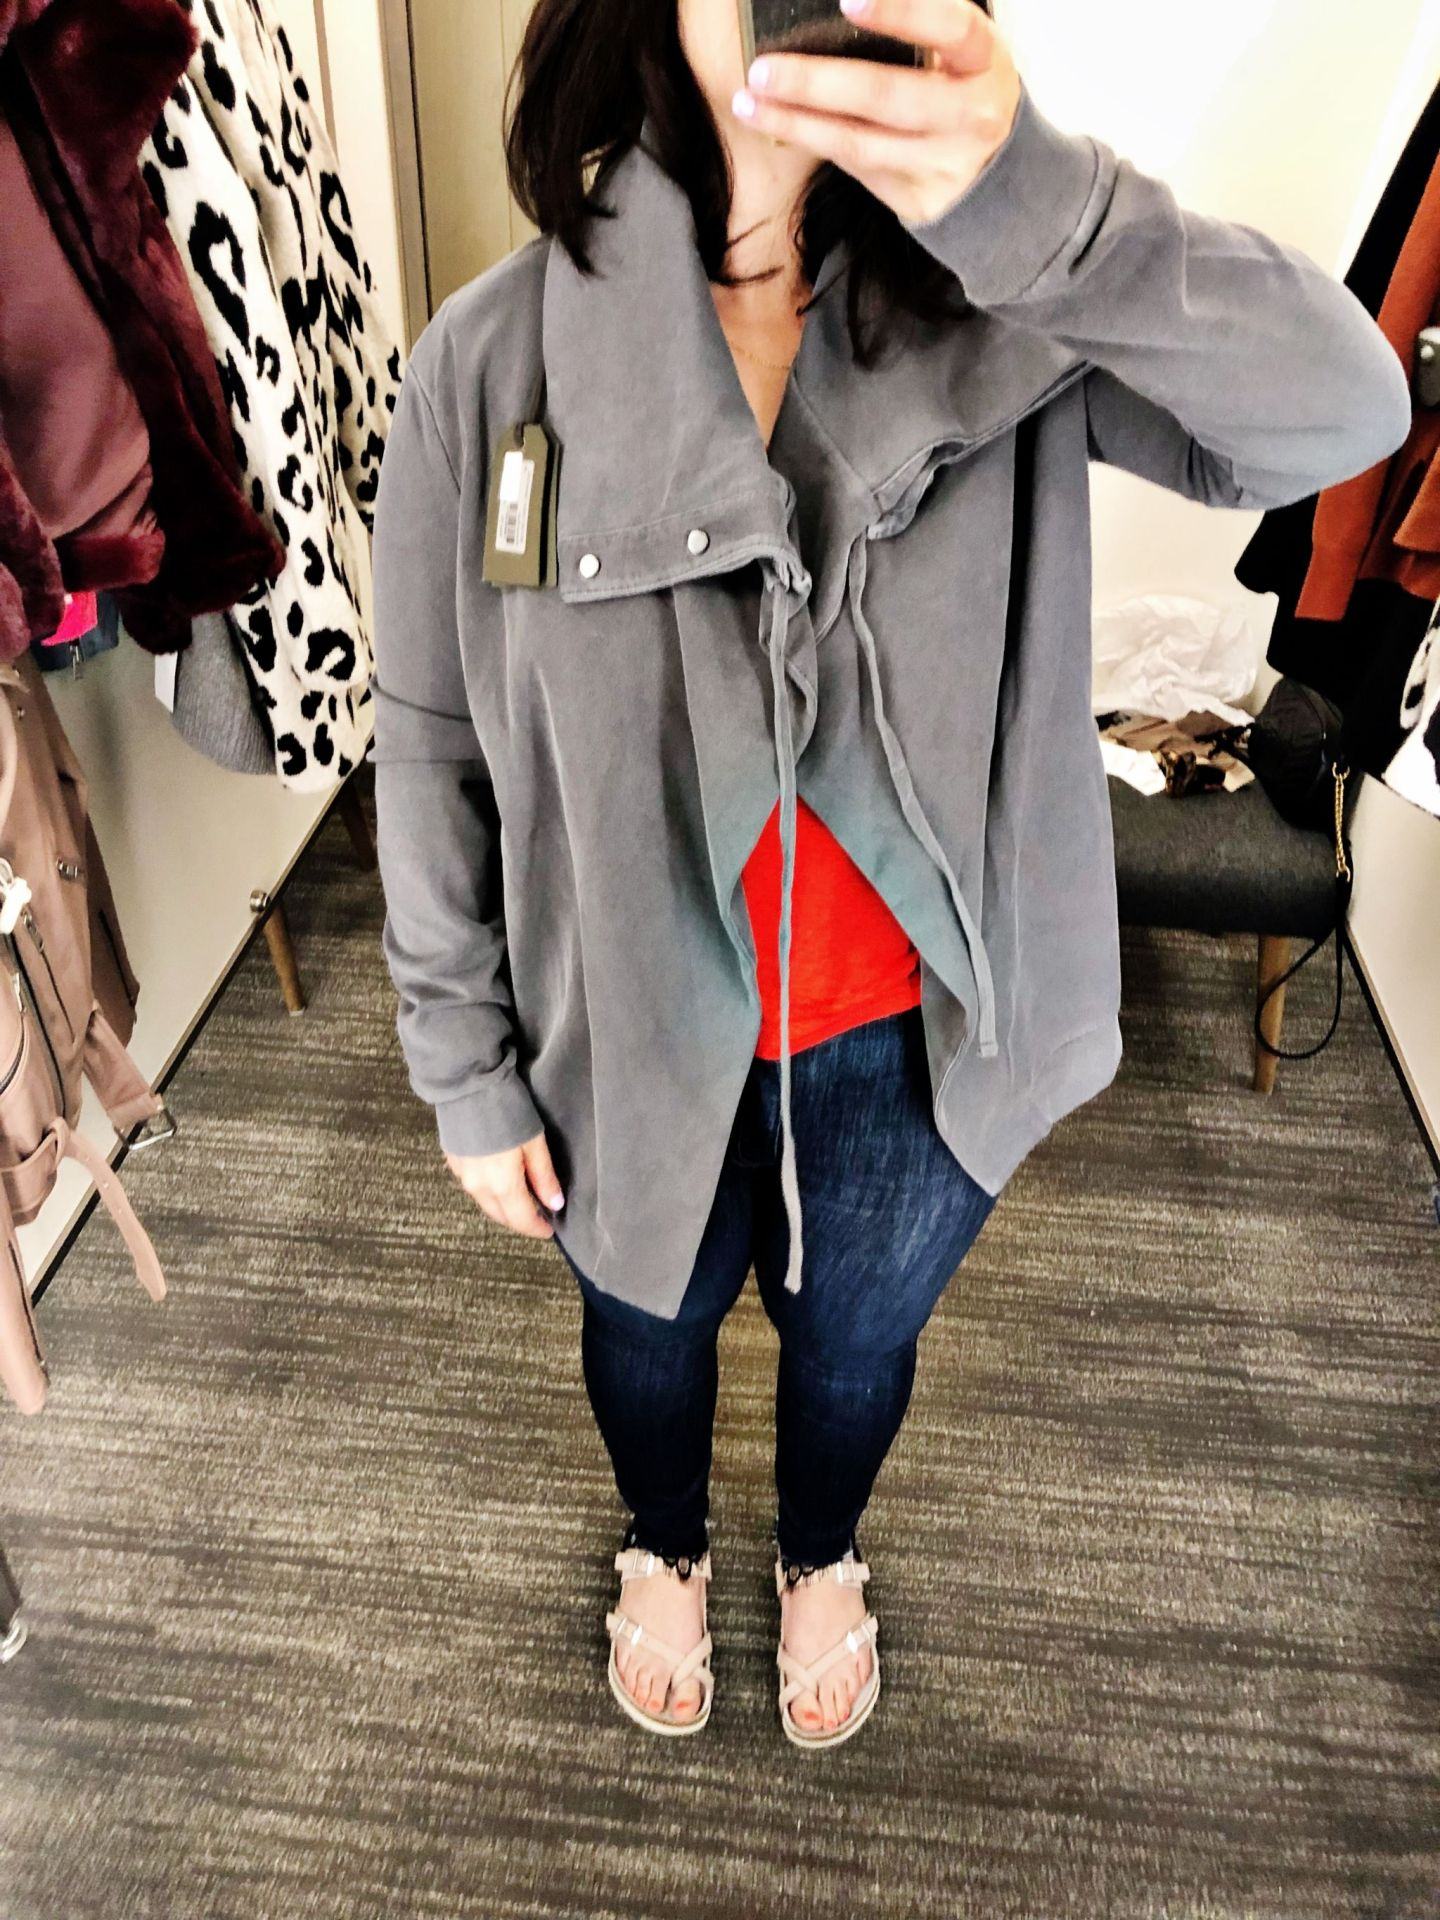 ALLSAINTS Brooke Knit Jacket | Anniversary Sale 2019 Dressing Room Selfies